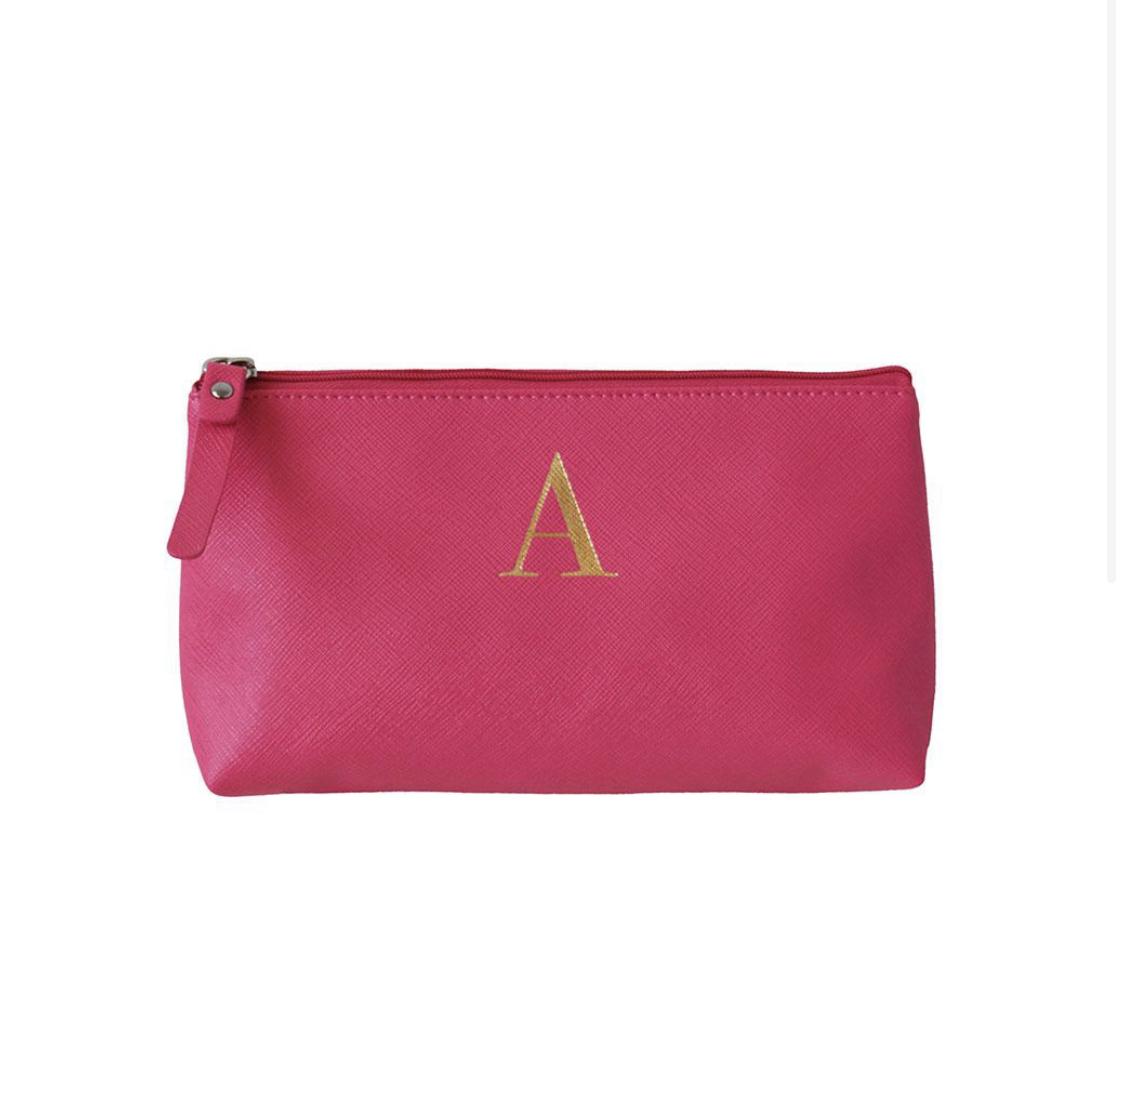 Bombay Duck Alphabet Make Up Bag - A